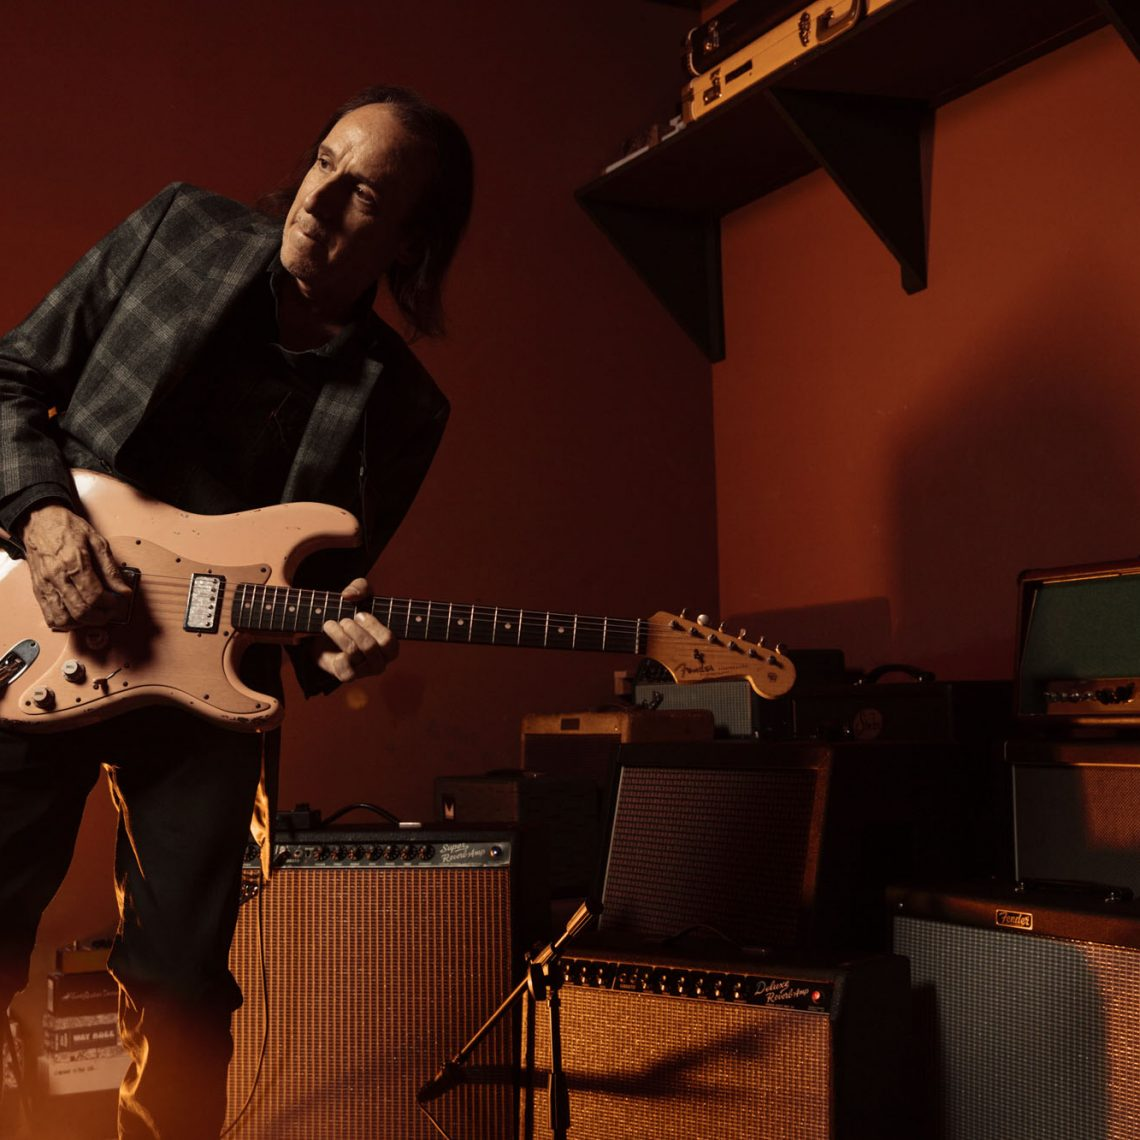 Michael Landau Reveals 'Killing Time' (live) From New Album 'Liquid Quartet Live'